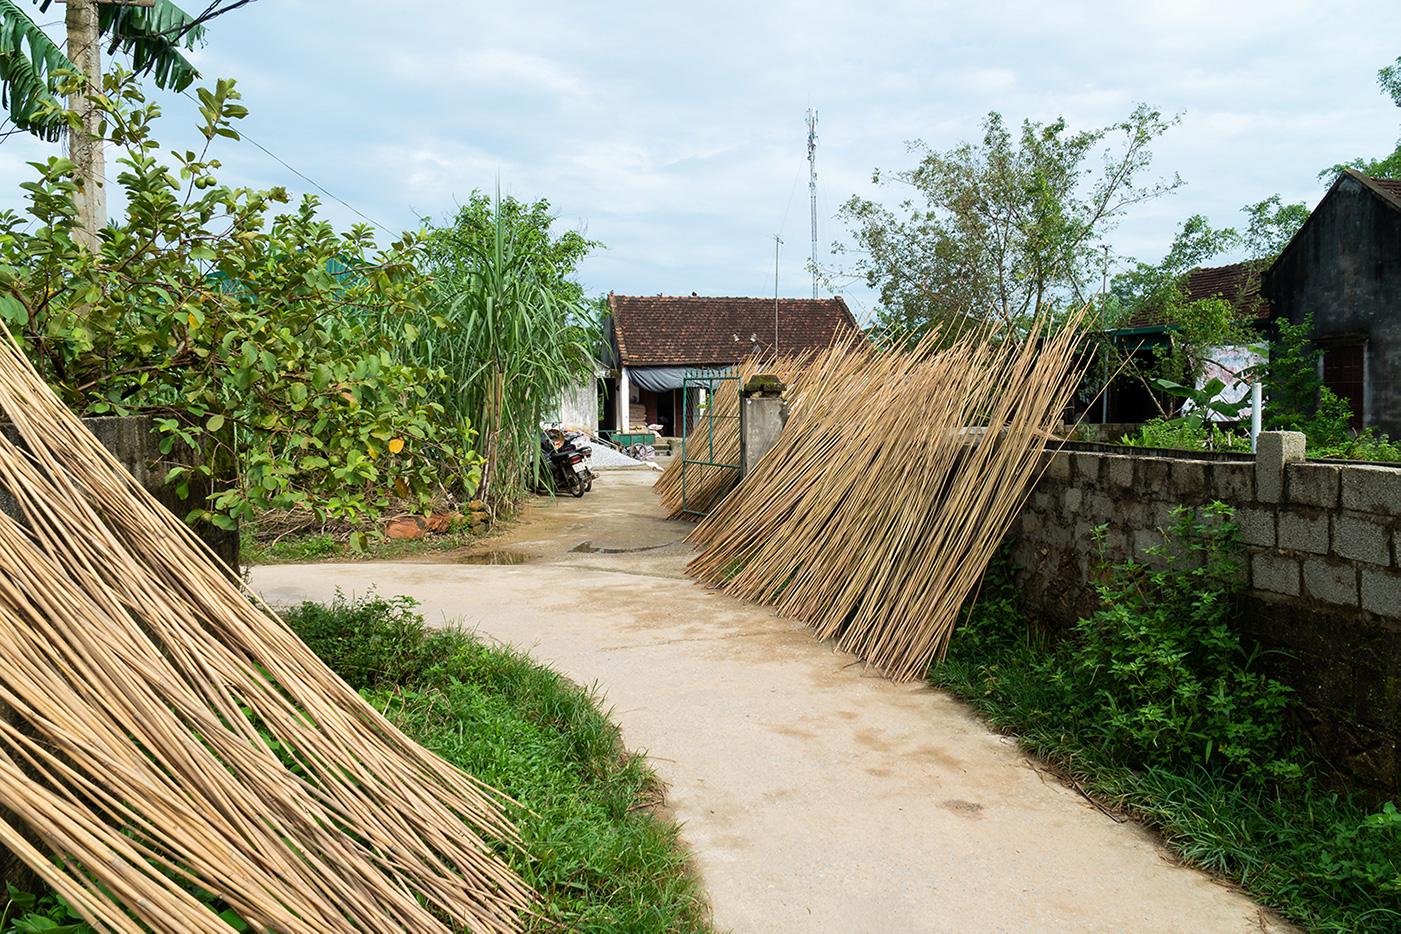 LOW-Jungle-Straws-Our-Farm-Sustainable-Alternative-To-Straws.jpg